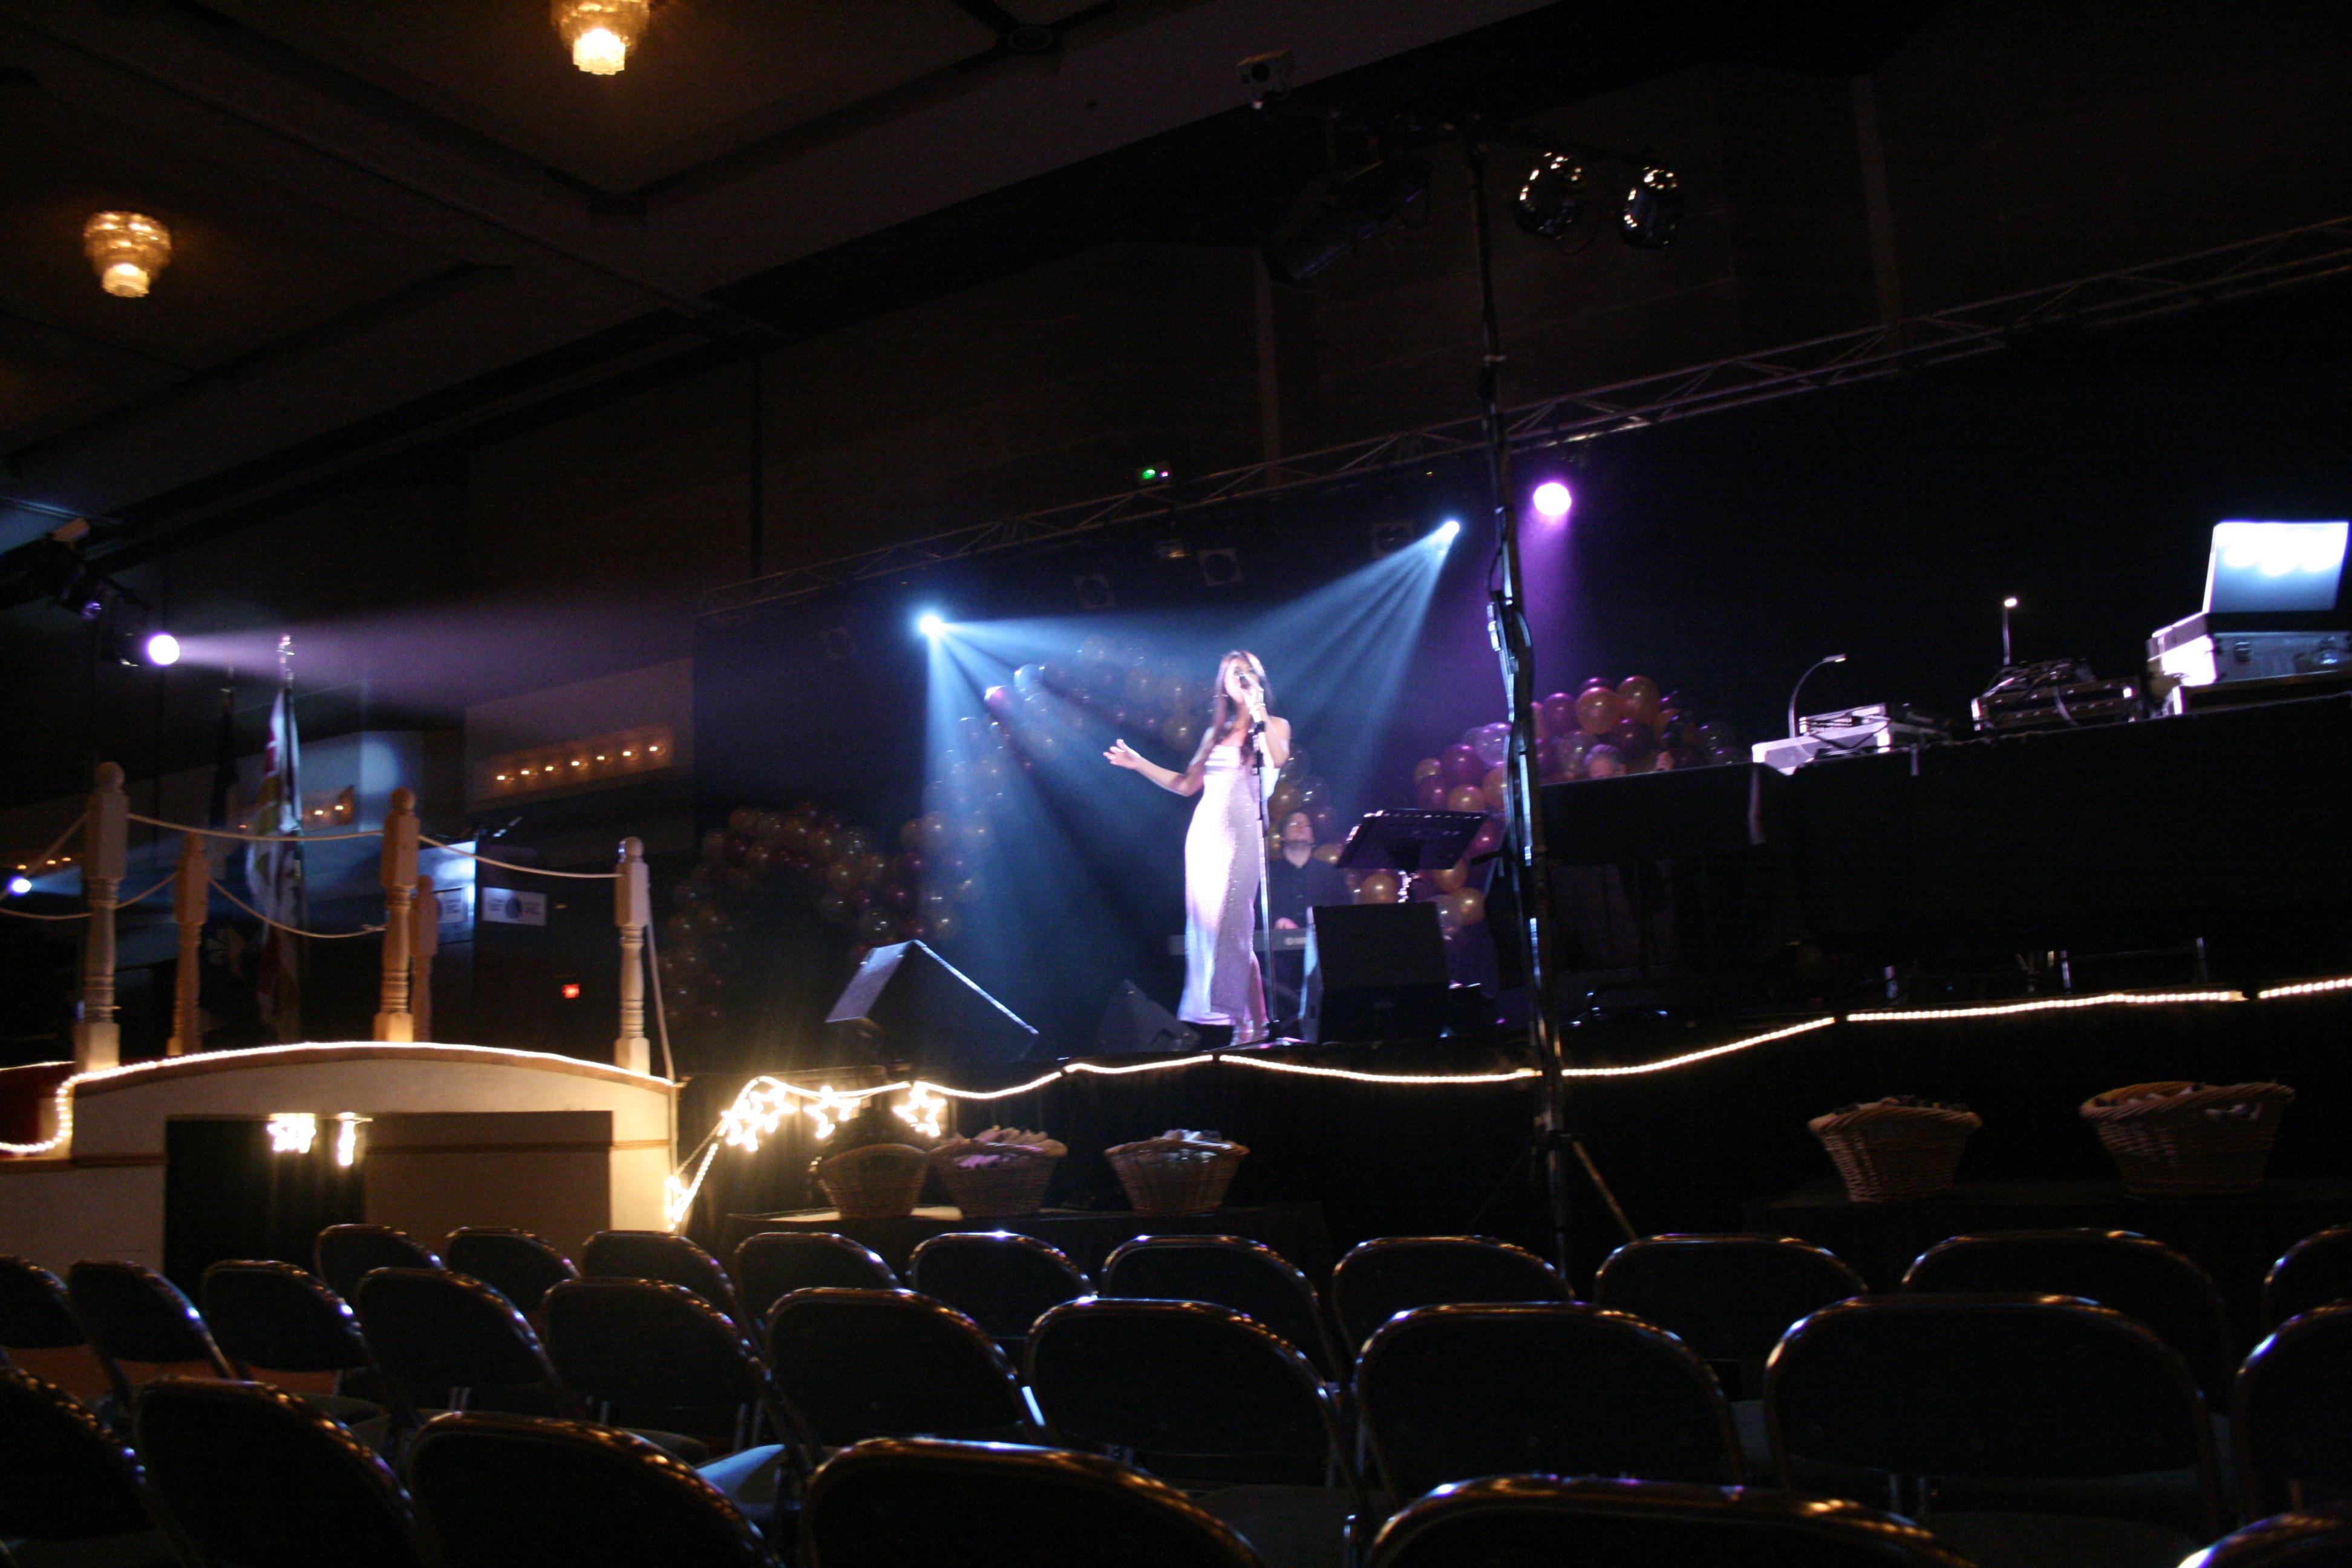 LIZA MELFI SINGER HONG KONG